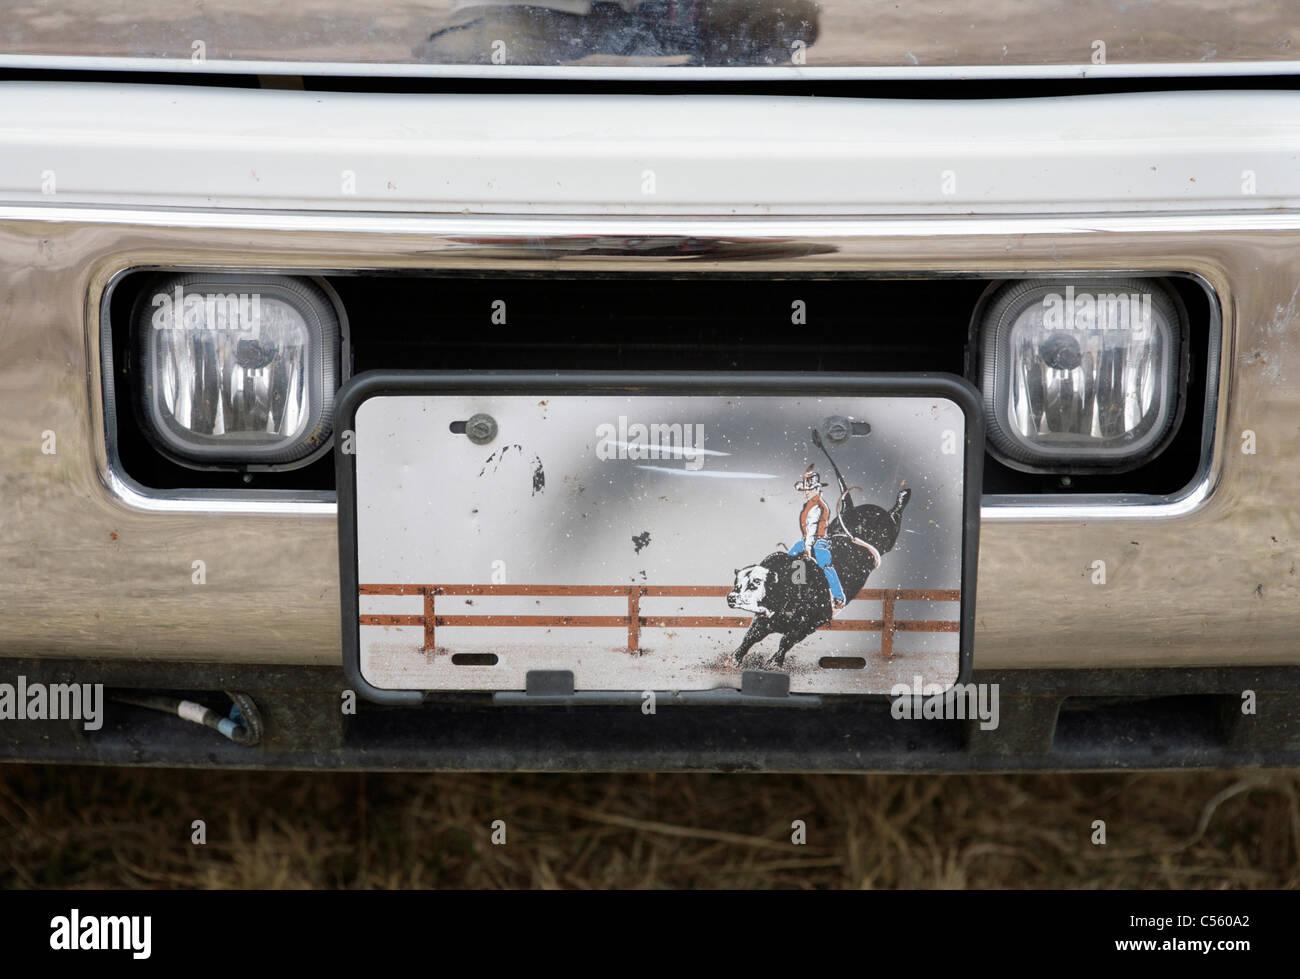 Plate License Stockfotos & Plate License Bilder - Seite 2 - Alamy